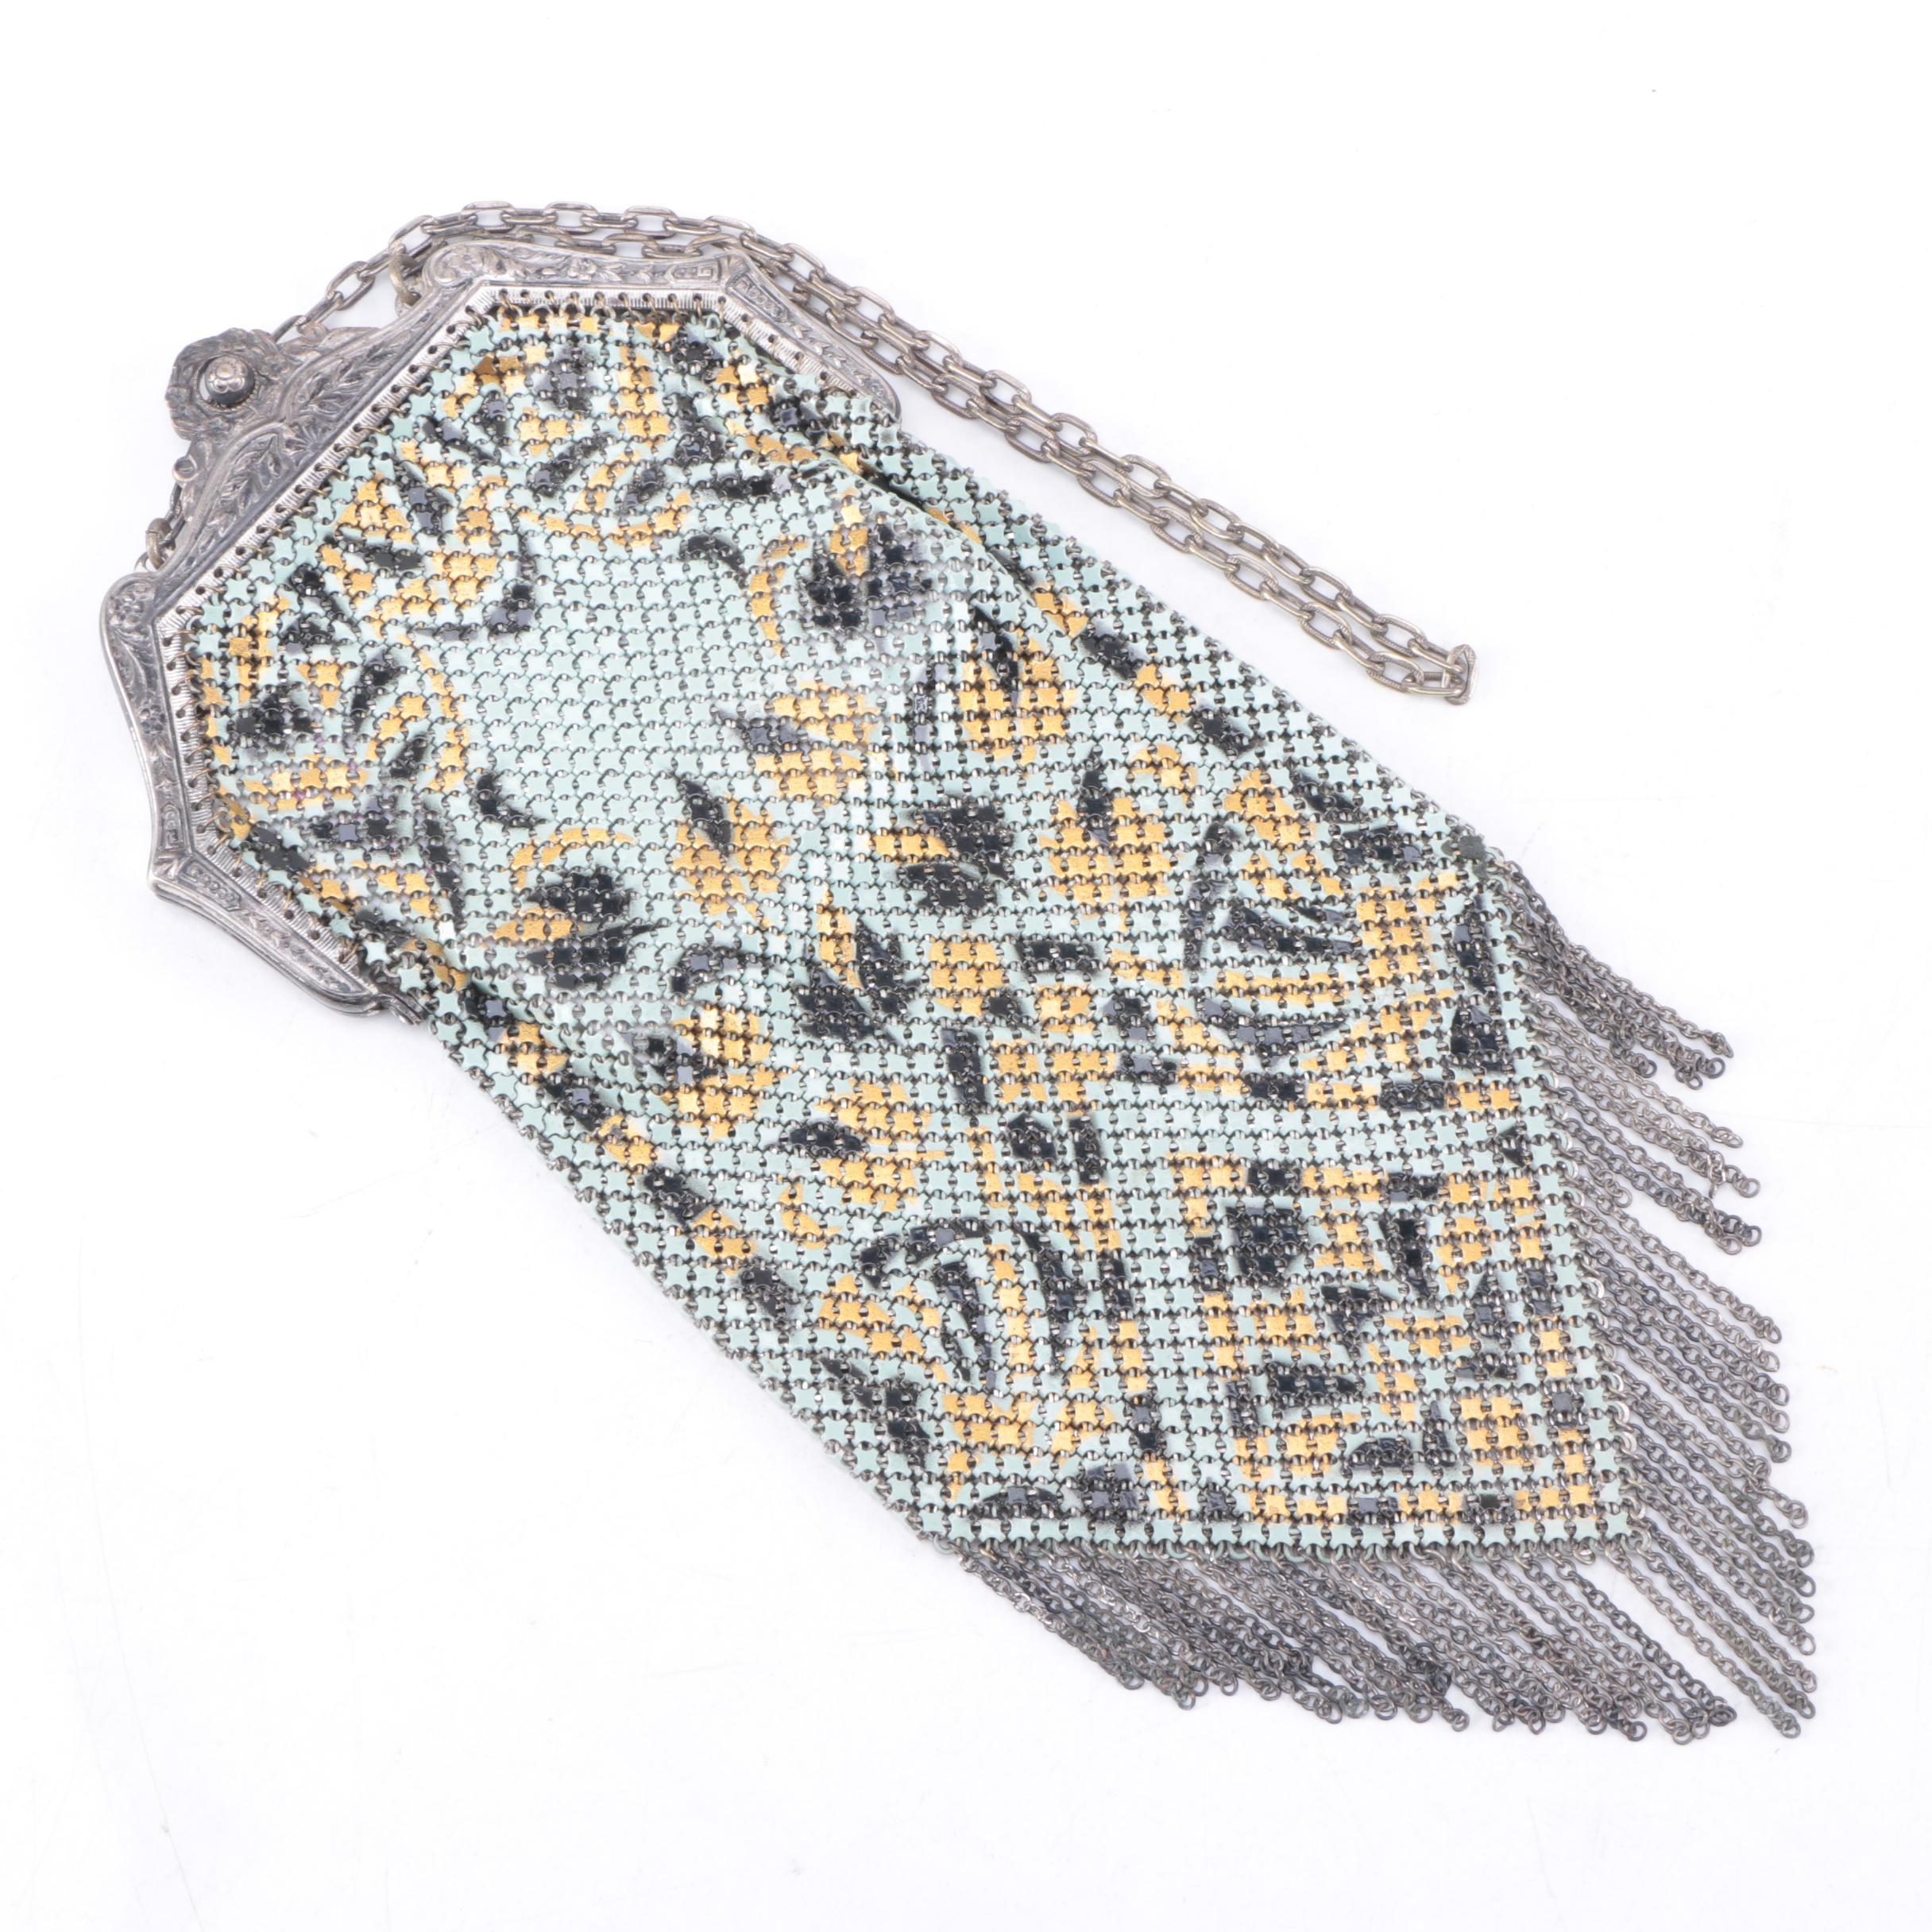 Circa 1920s Vintage Mandalian Enameled Mesh Handbag